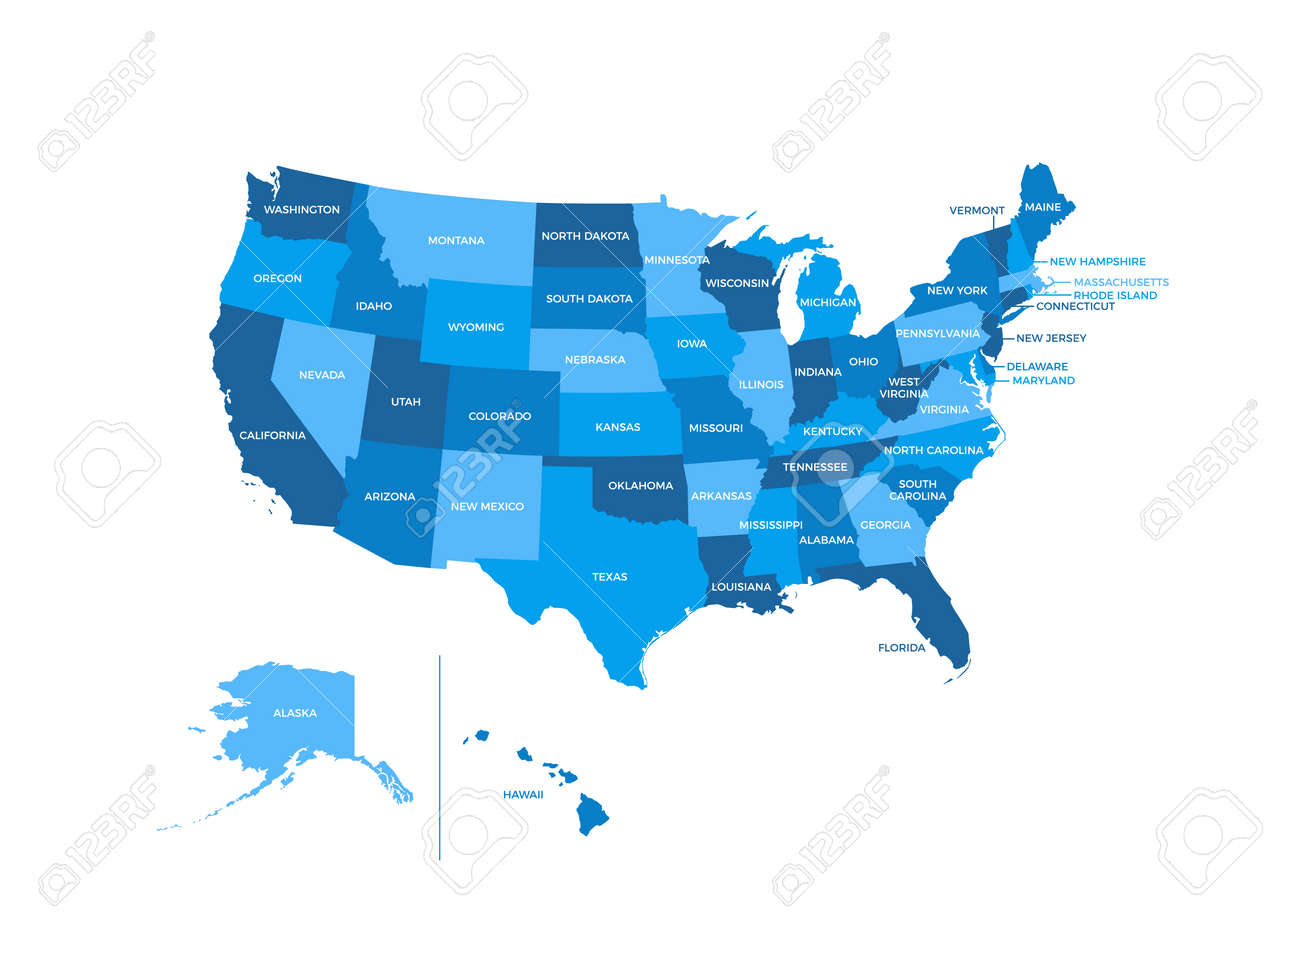 United States of America USA Regions Map